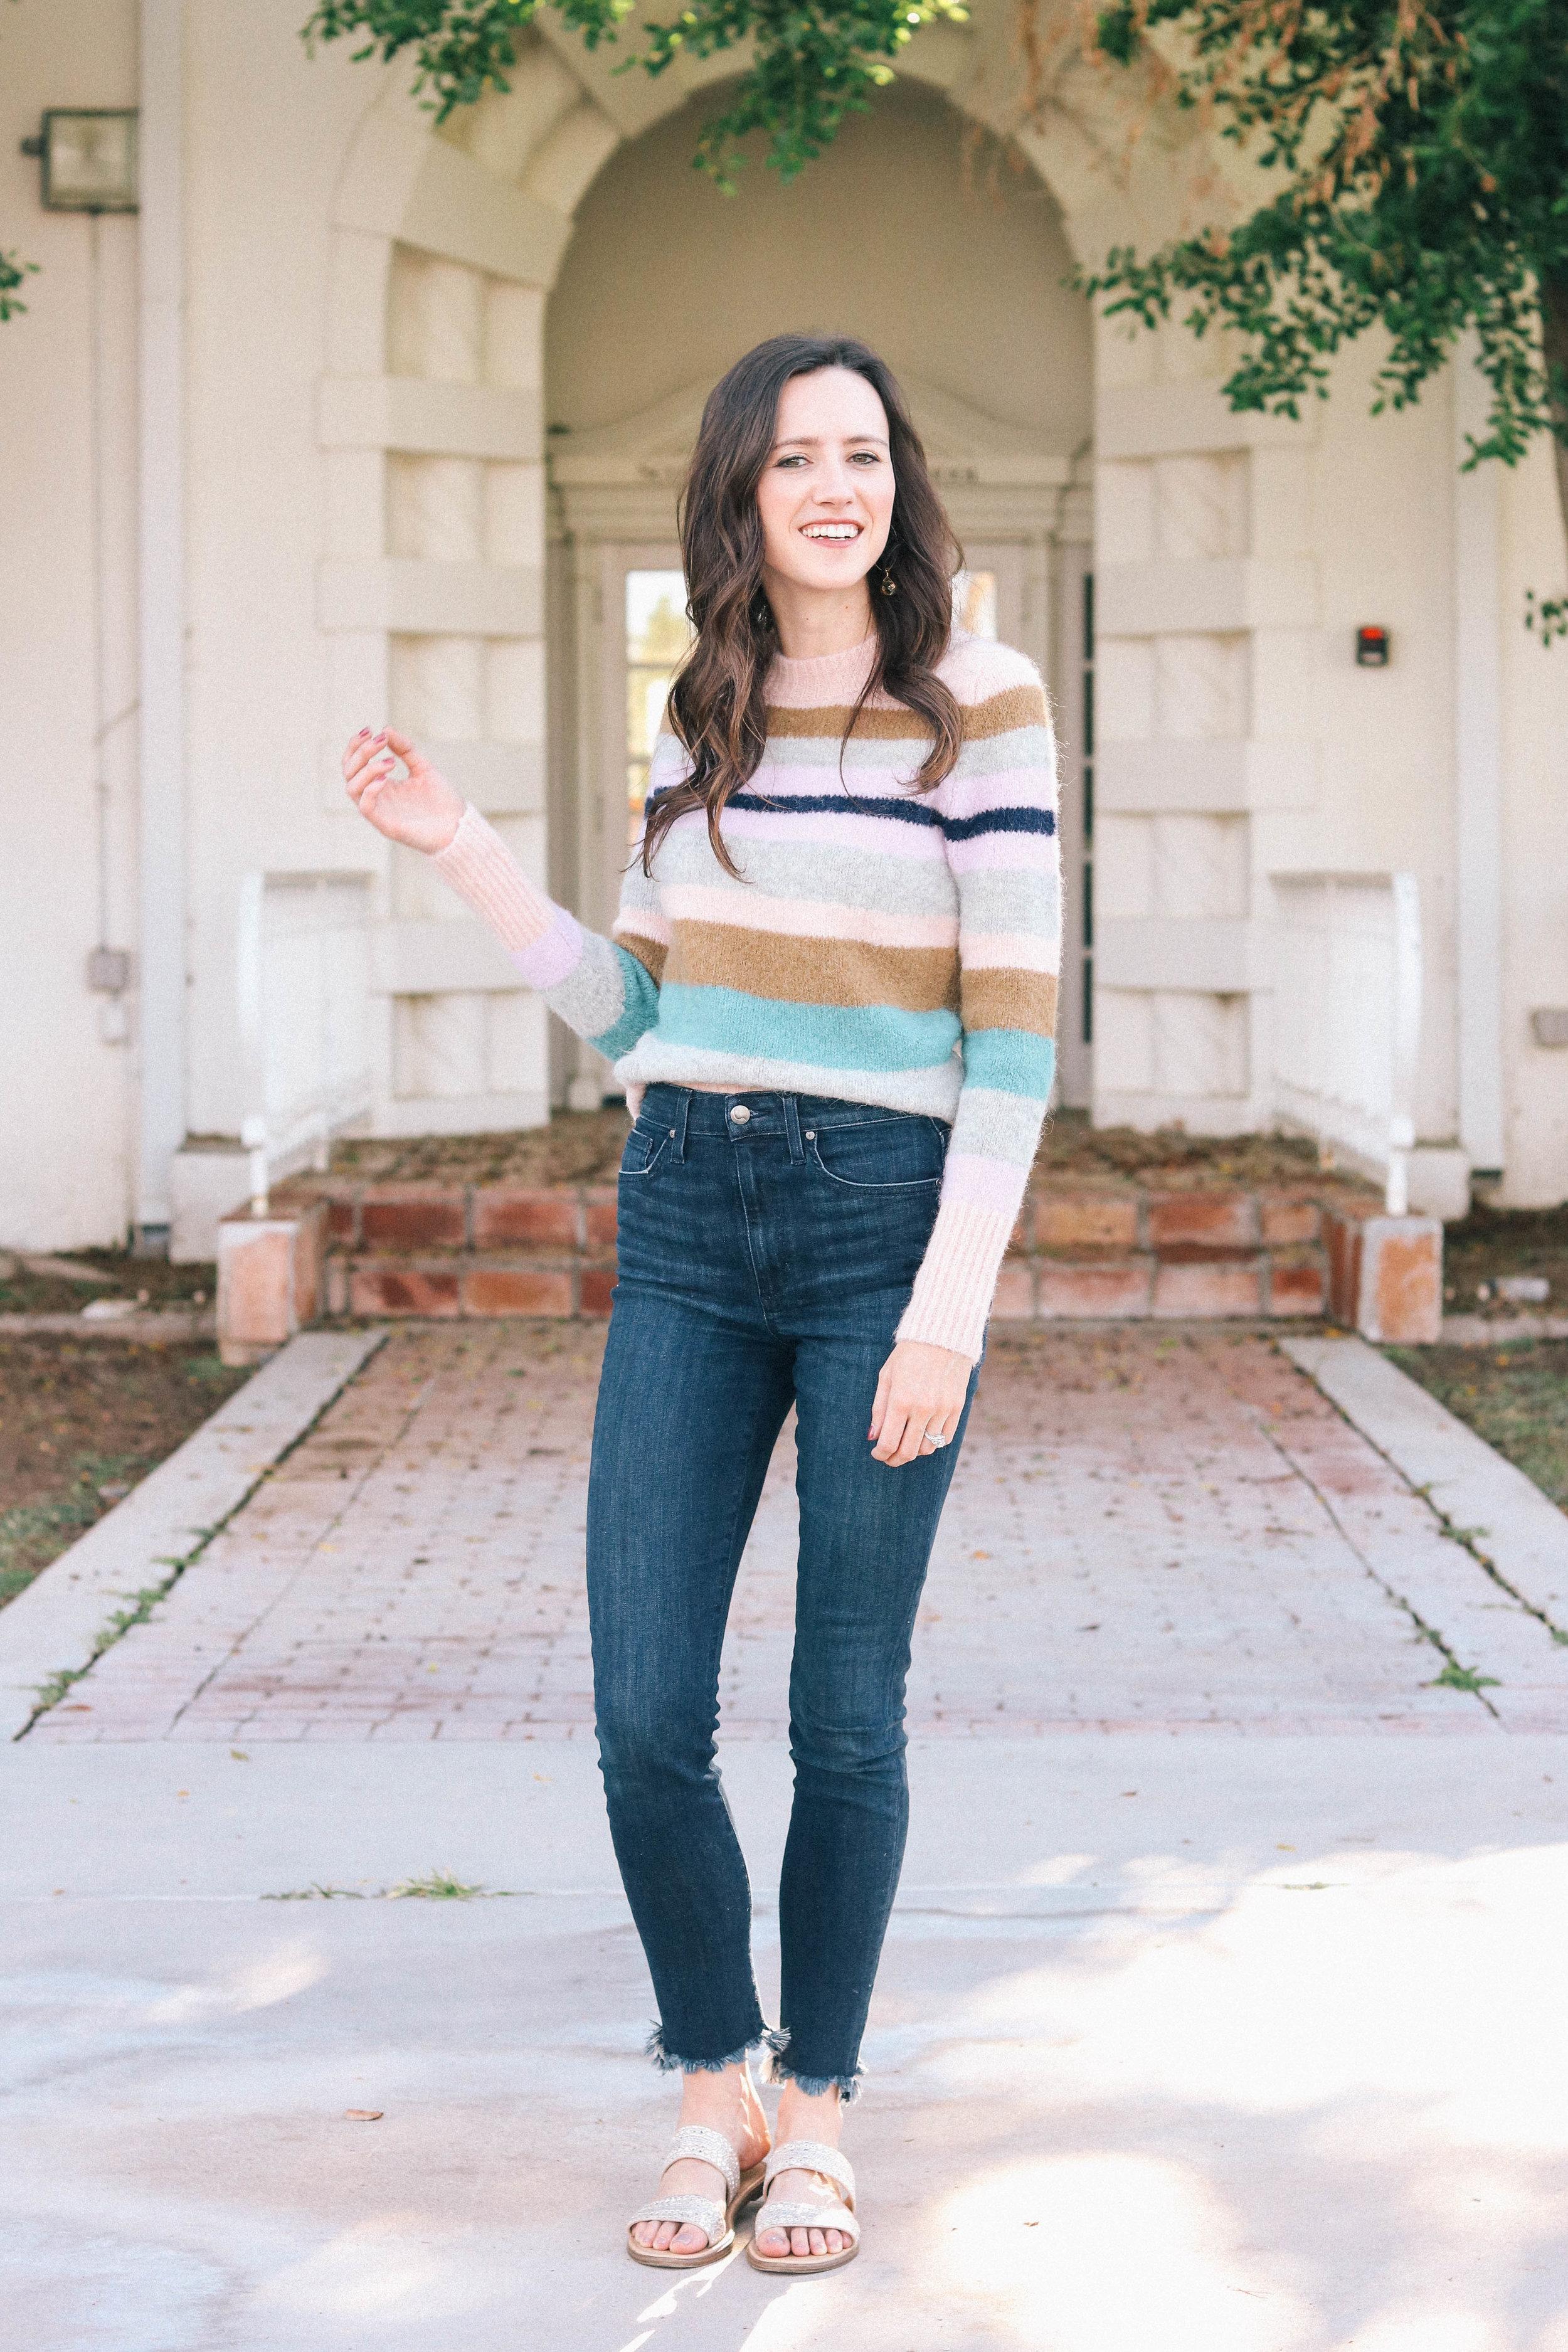 bb-striped-sweater-002 (1 of 1).jpg